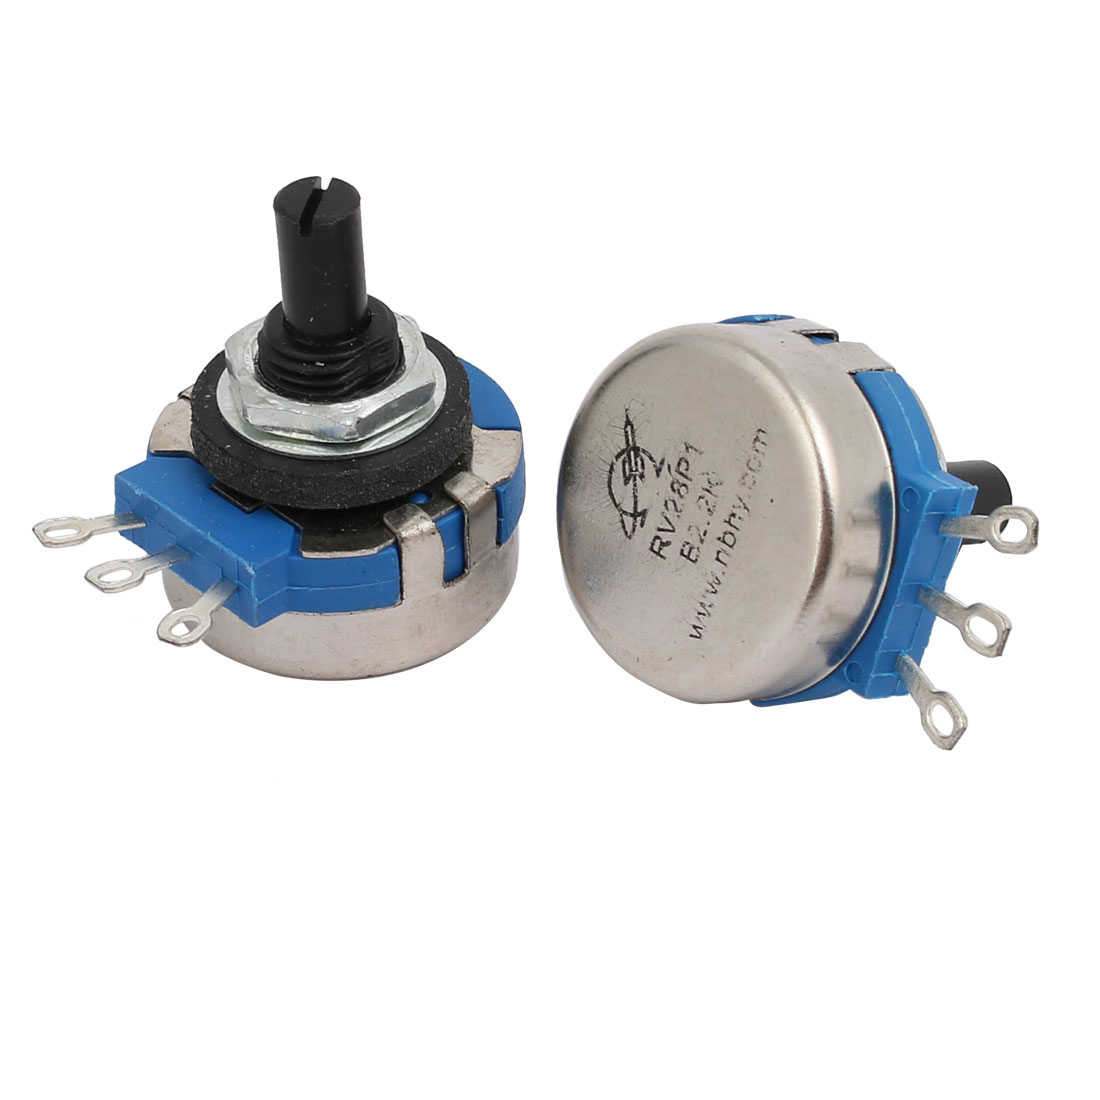 Guitar Pots Audio Tone 2.2K Ohm Potentiometer Switch Replacement 2pcs - image 1 of 2